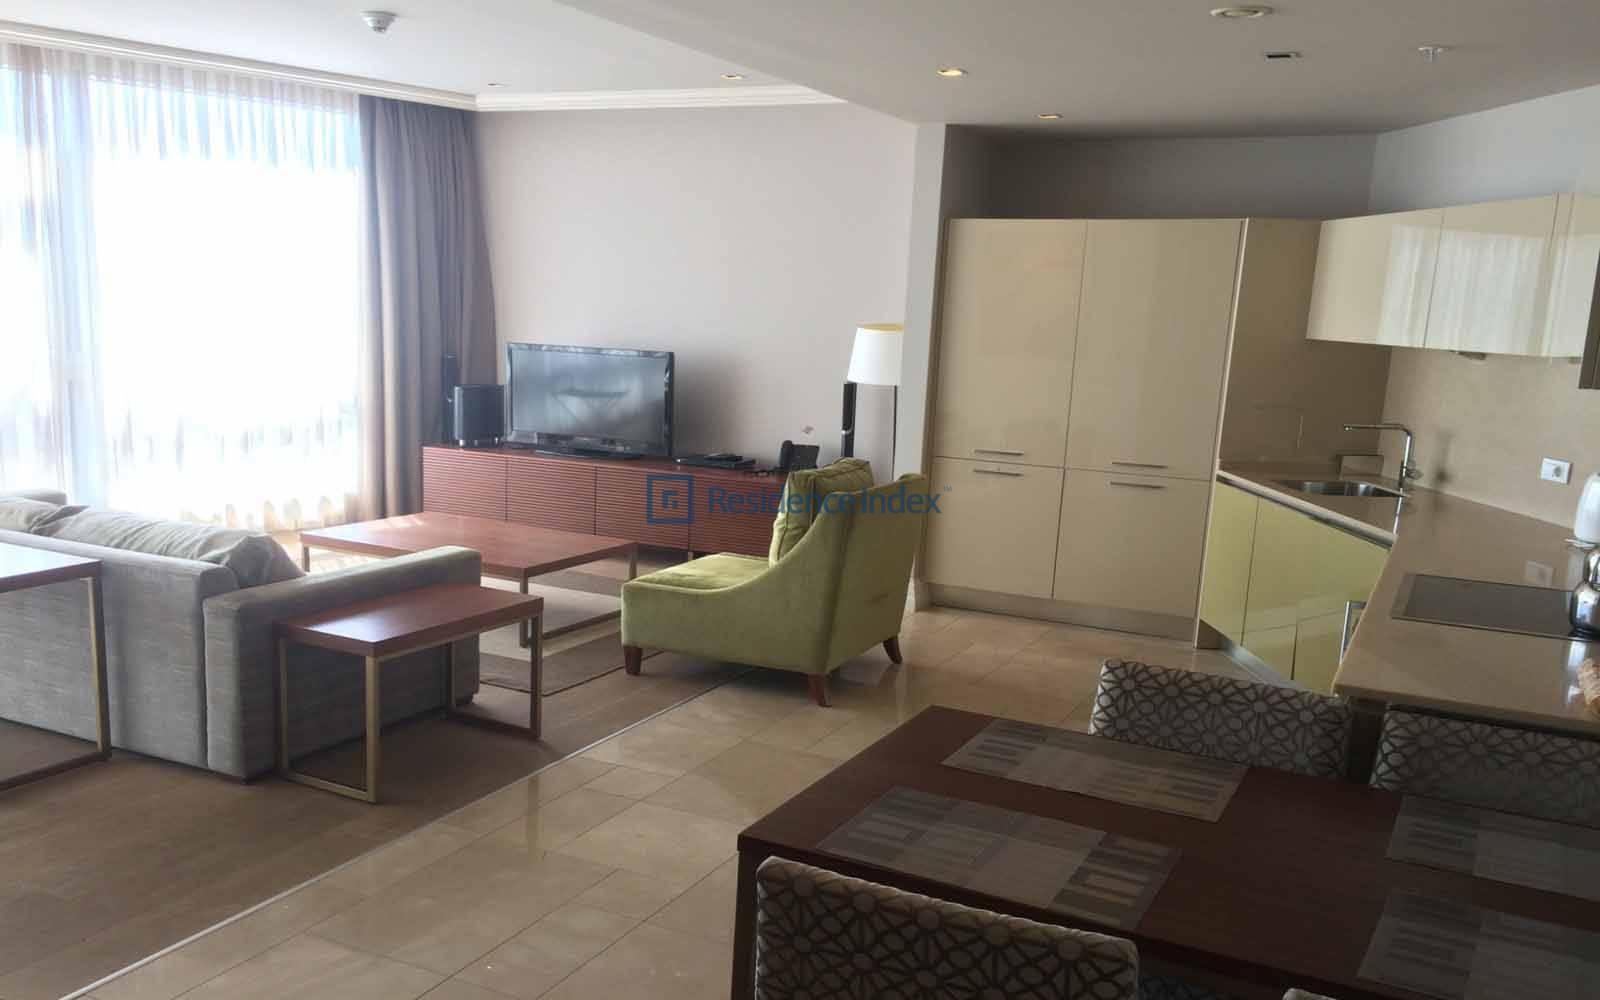 Bomonti Divan Residence - Divan Residence Bomonti 1 + 1 Luxury Apartment For Rent